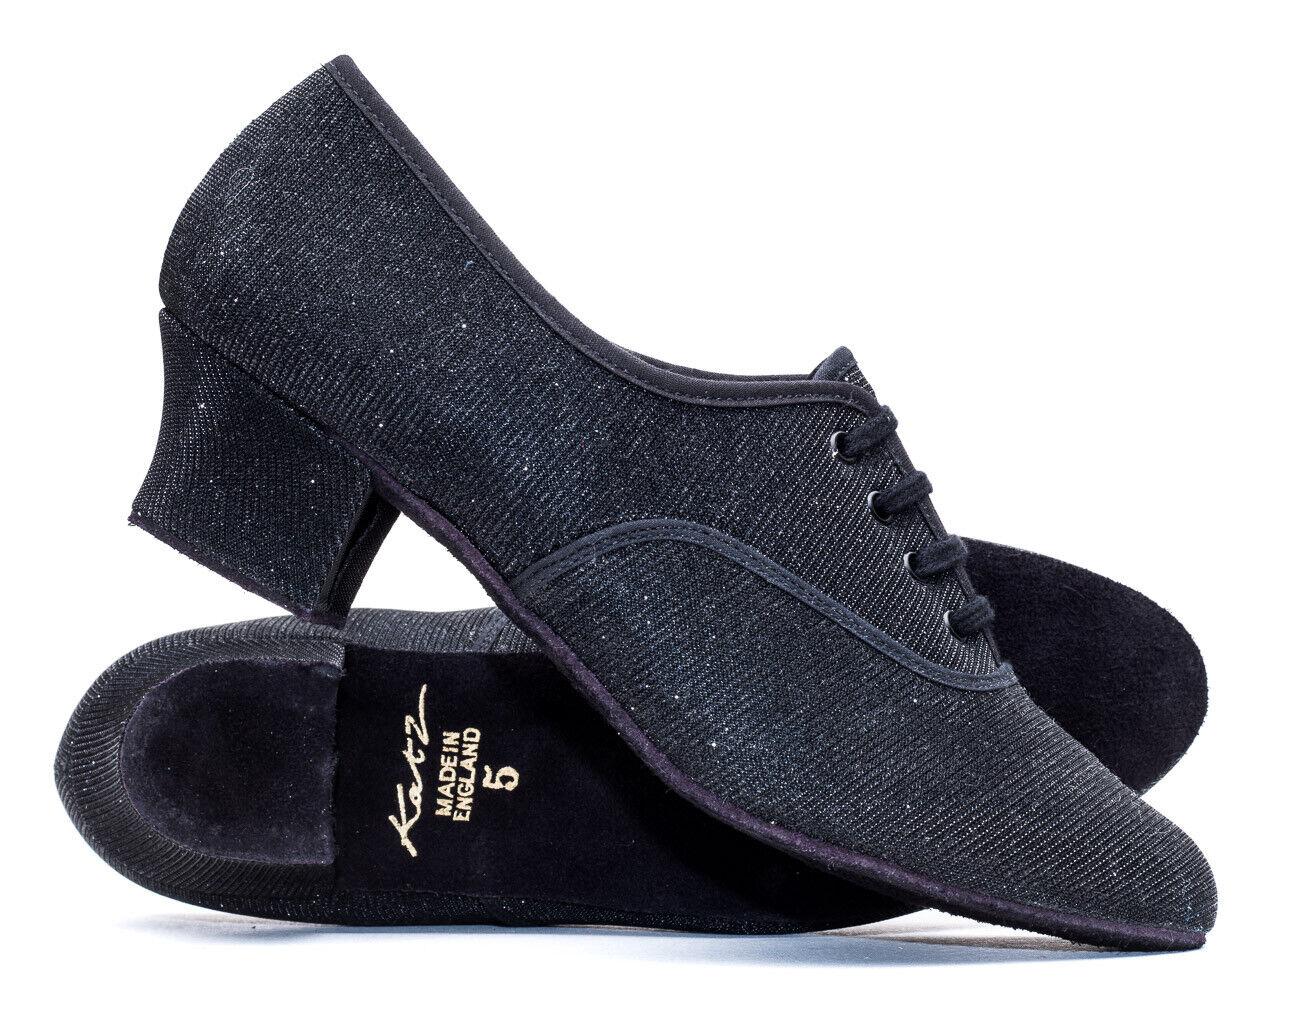 Black Glitter Cuban Heel Suede Sole Lace Up Practice Stage Ballroom Shoes Katz